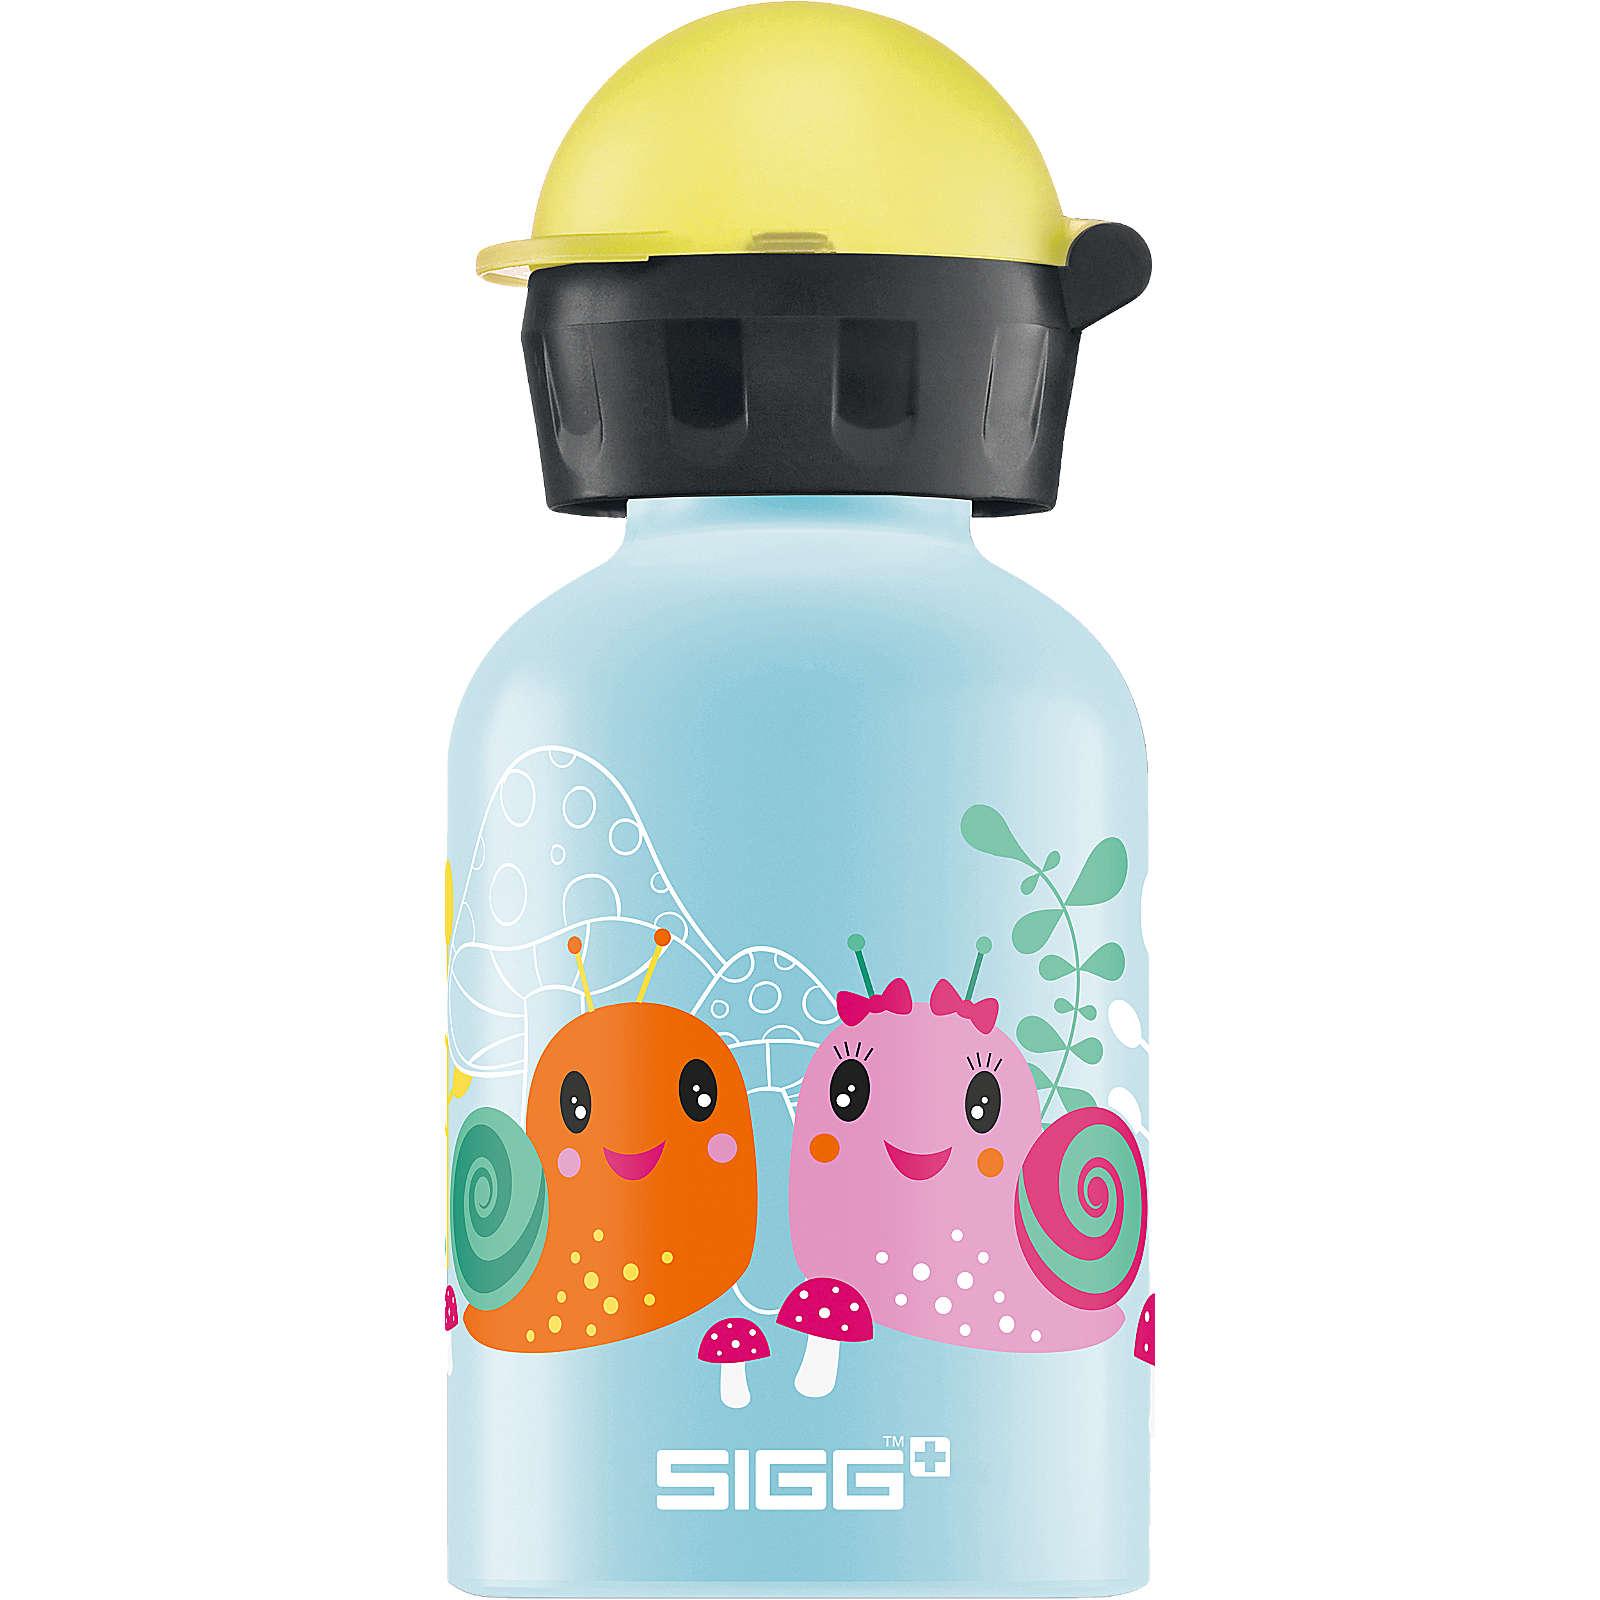 SIGG Alu-Trinkflasche Small World, 300 ml hellblau Mädchen